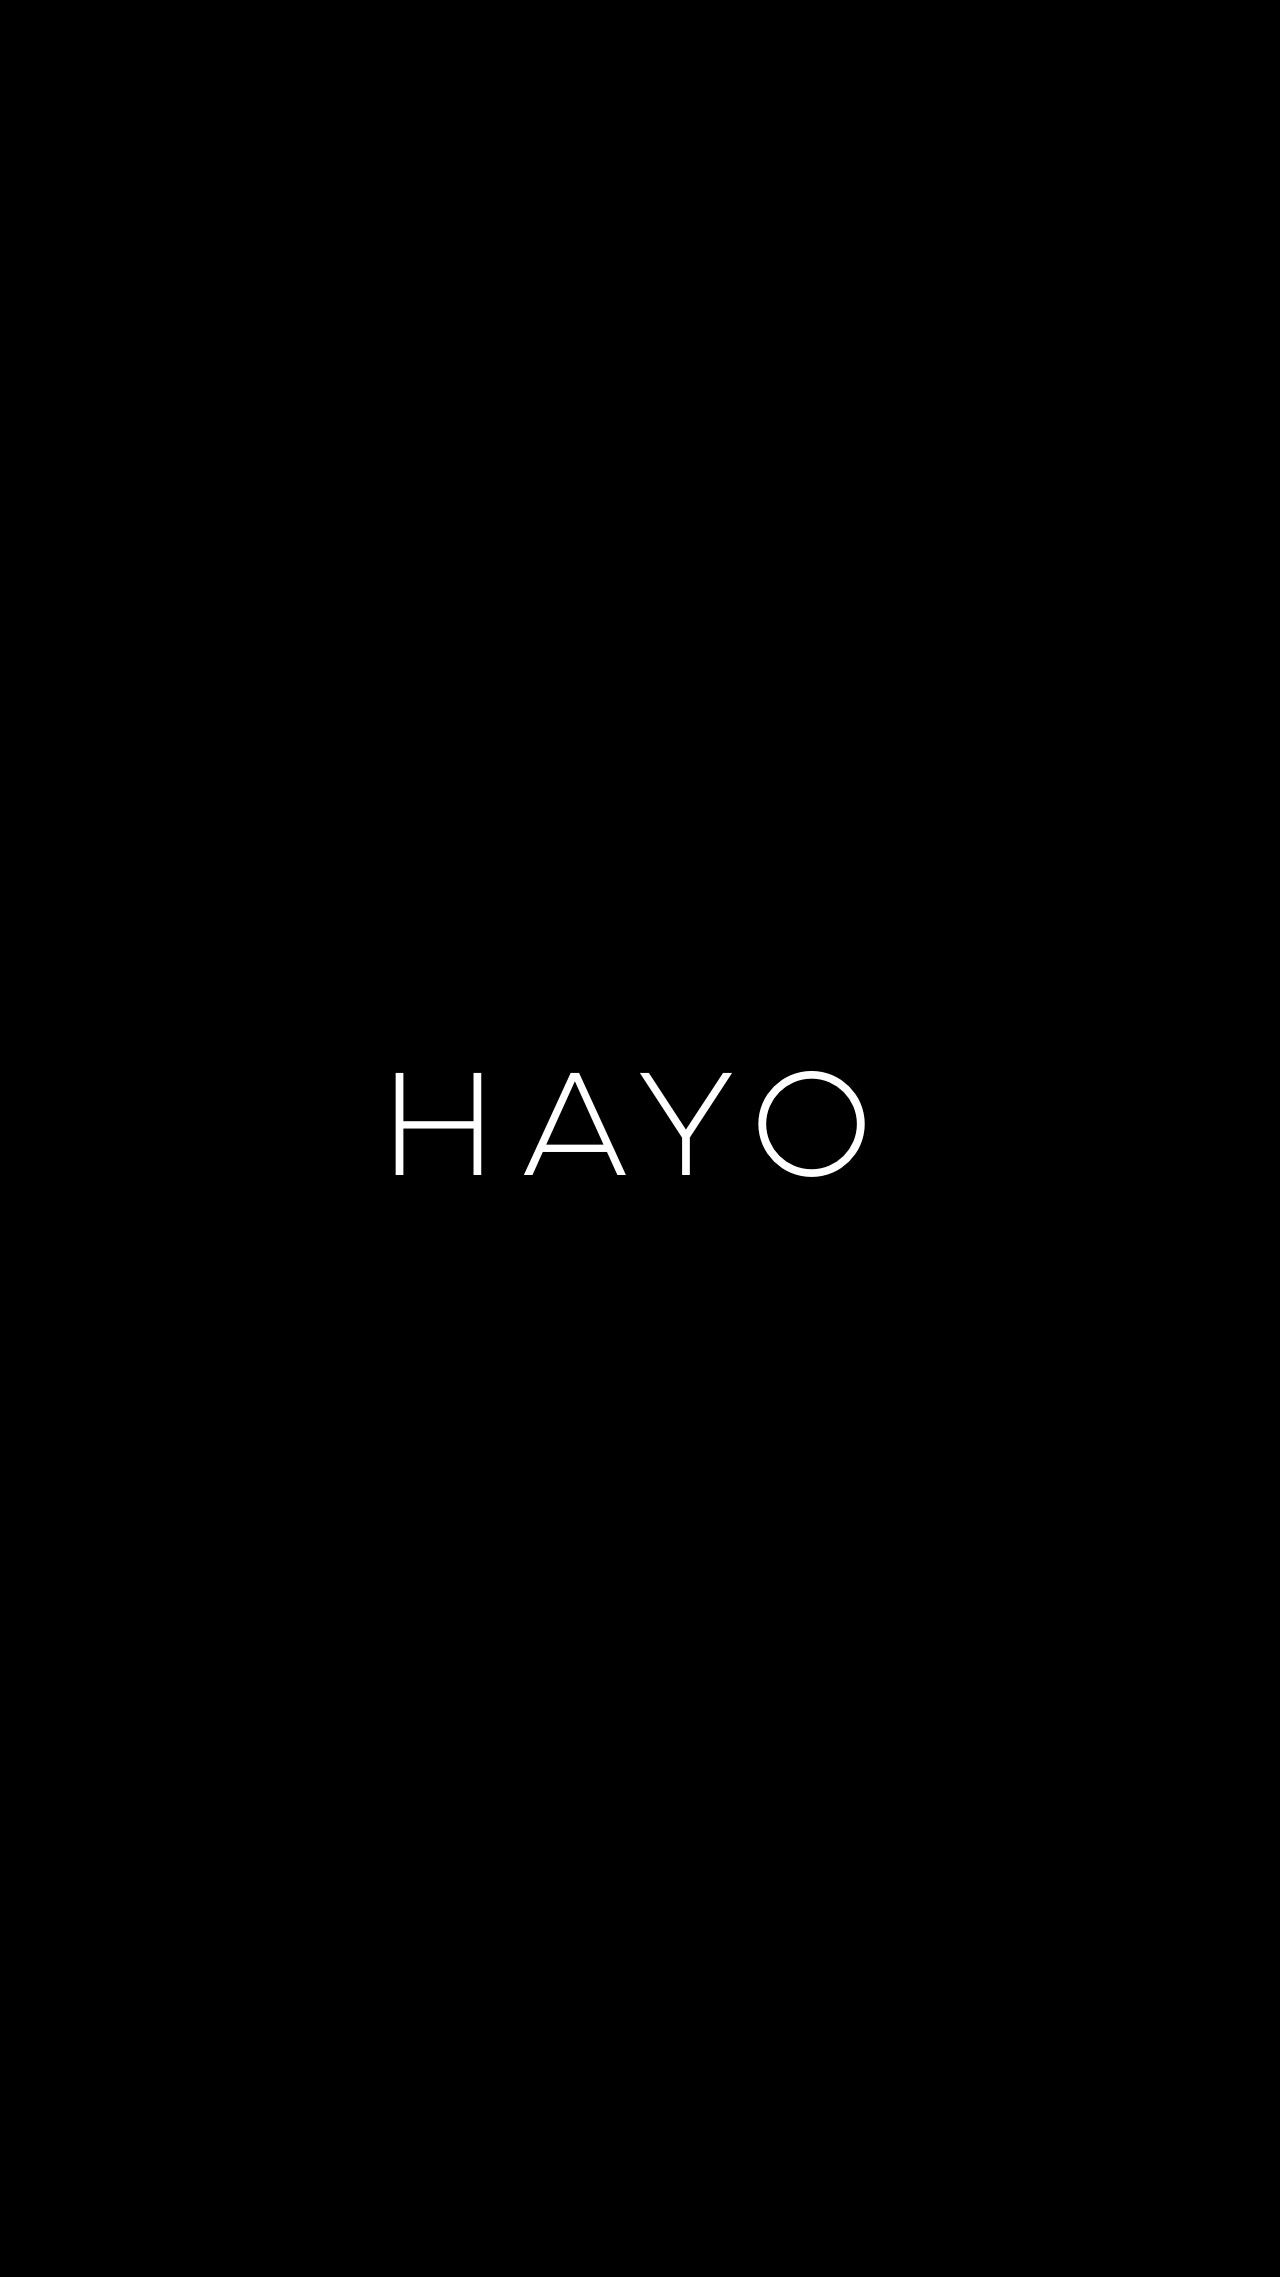 HAYO.jpg